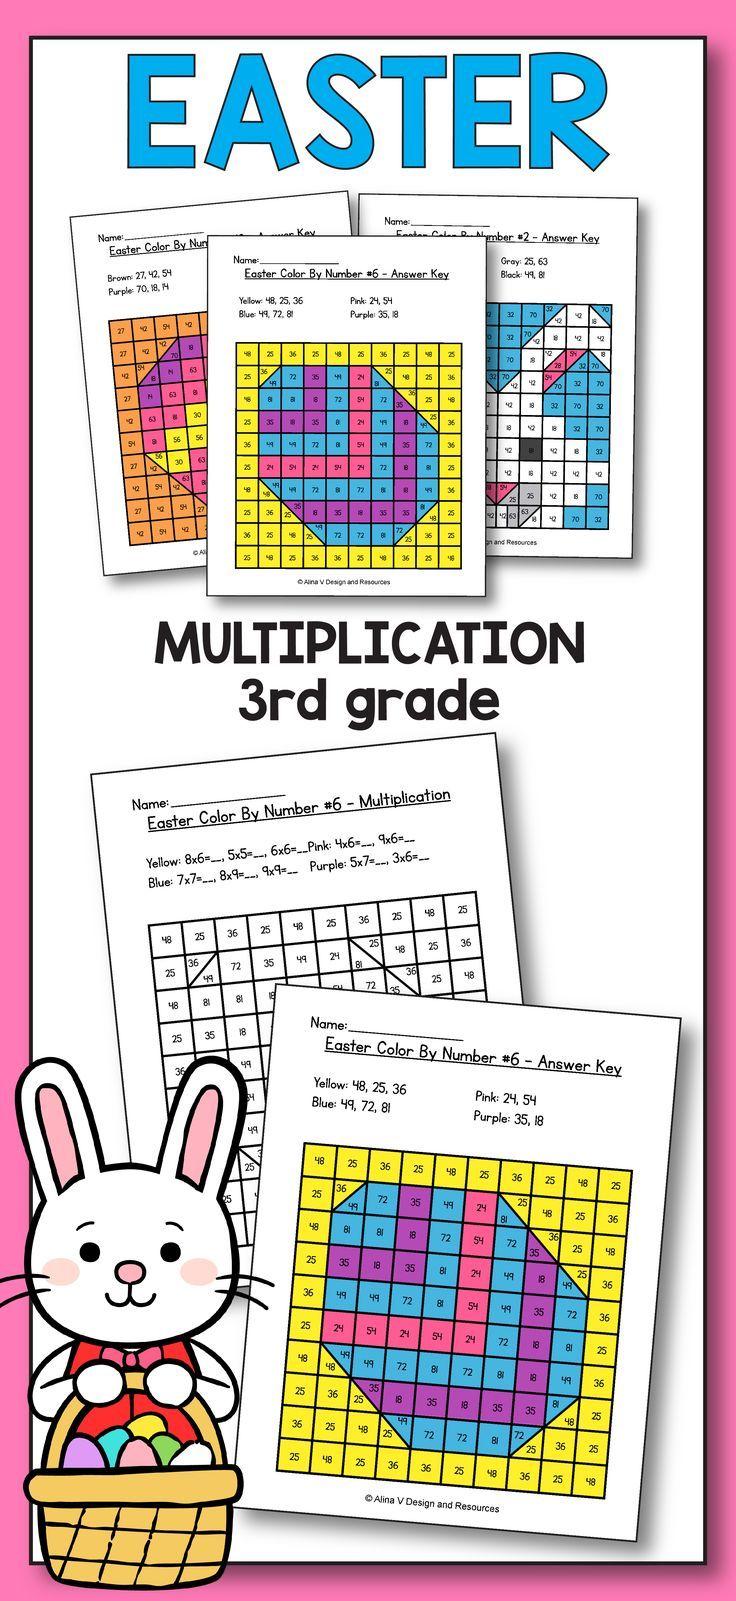 Easter math worksheets for 3rd grade